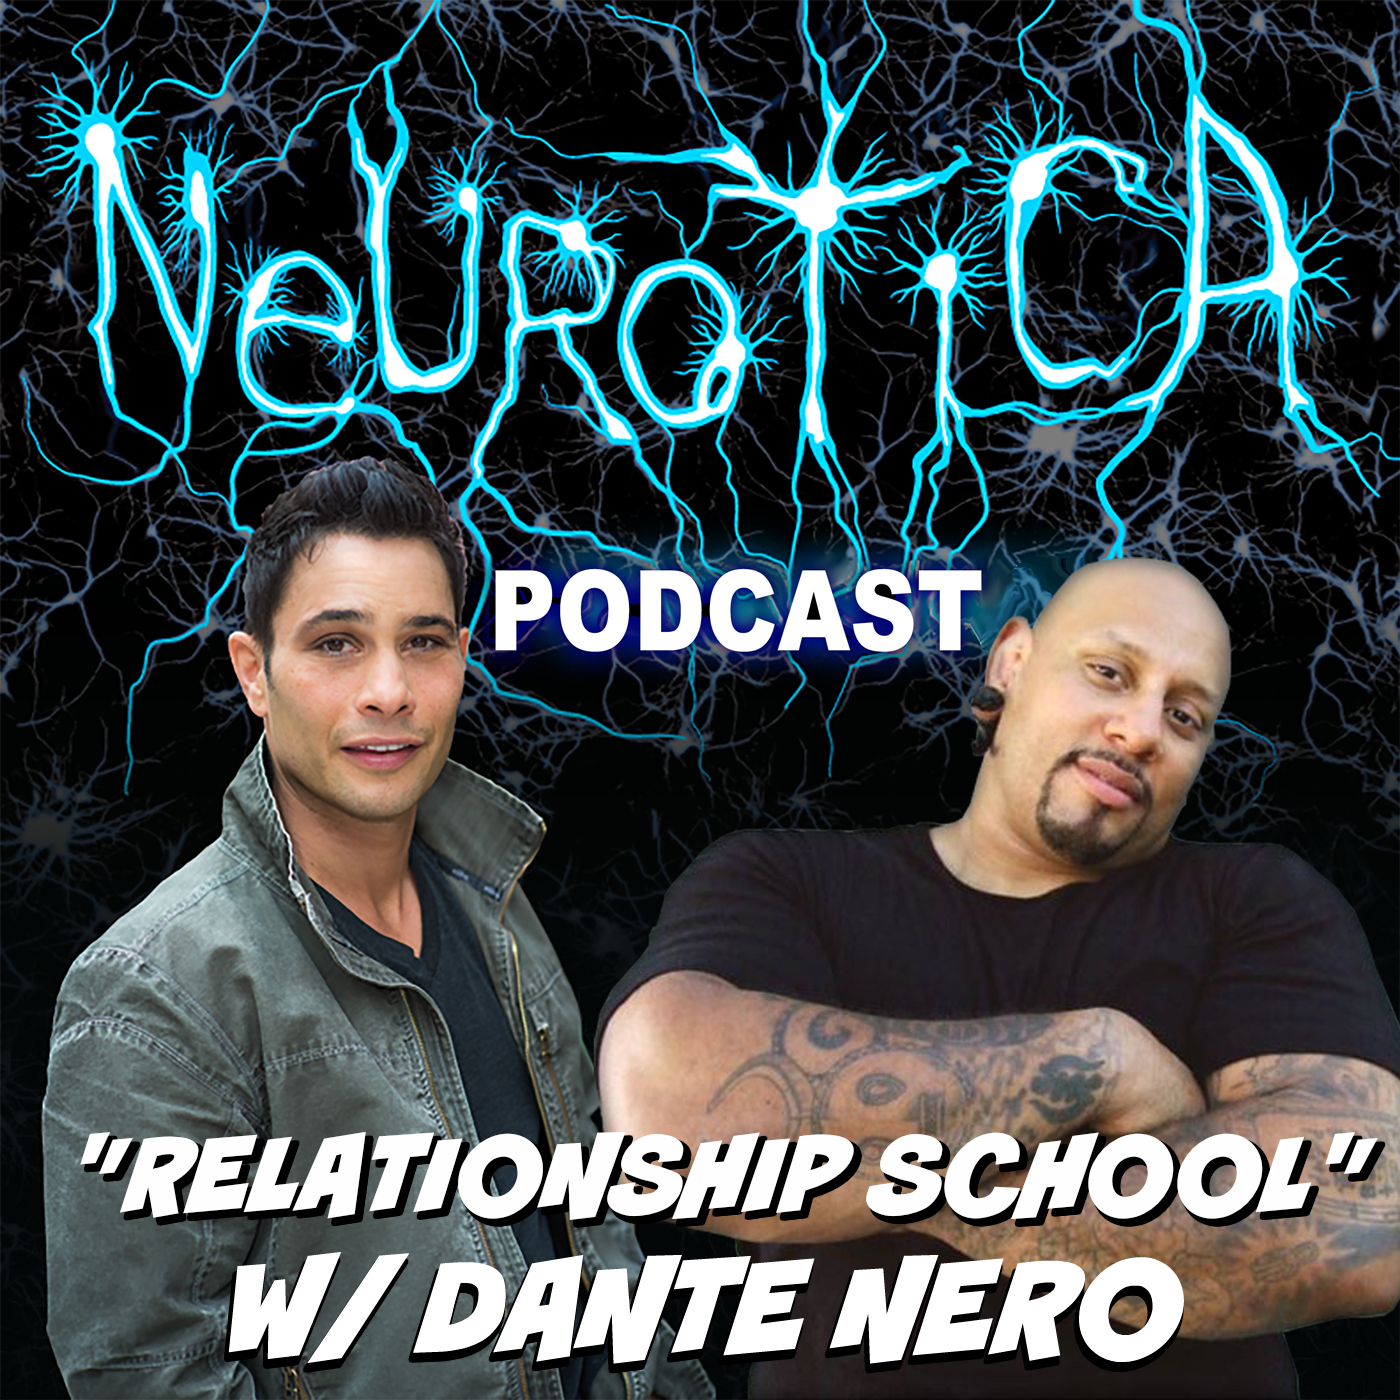 neurotica relationship school w